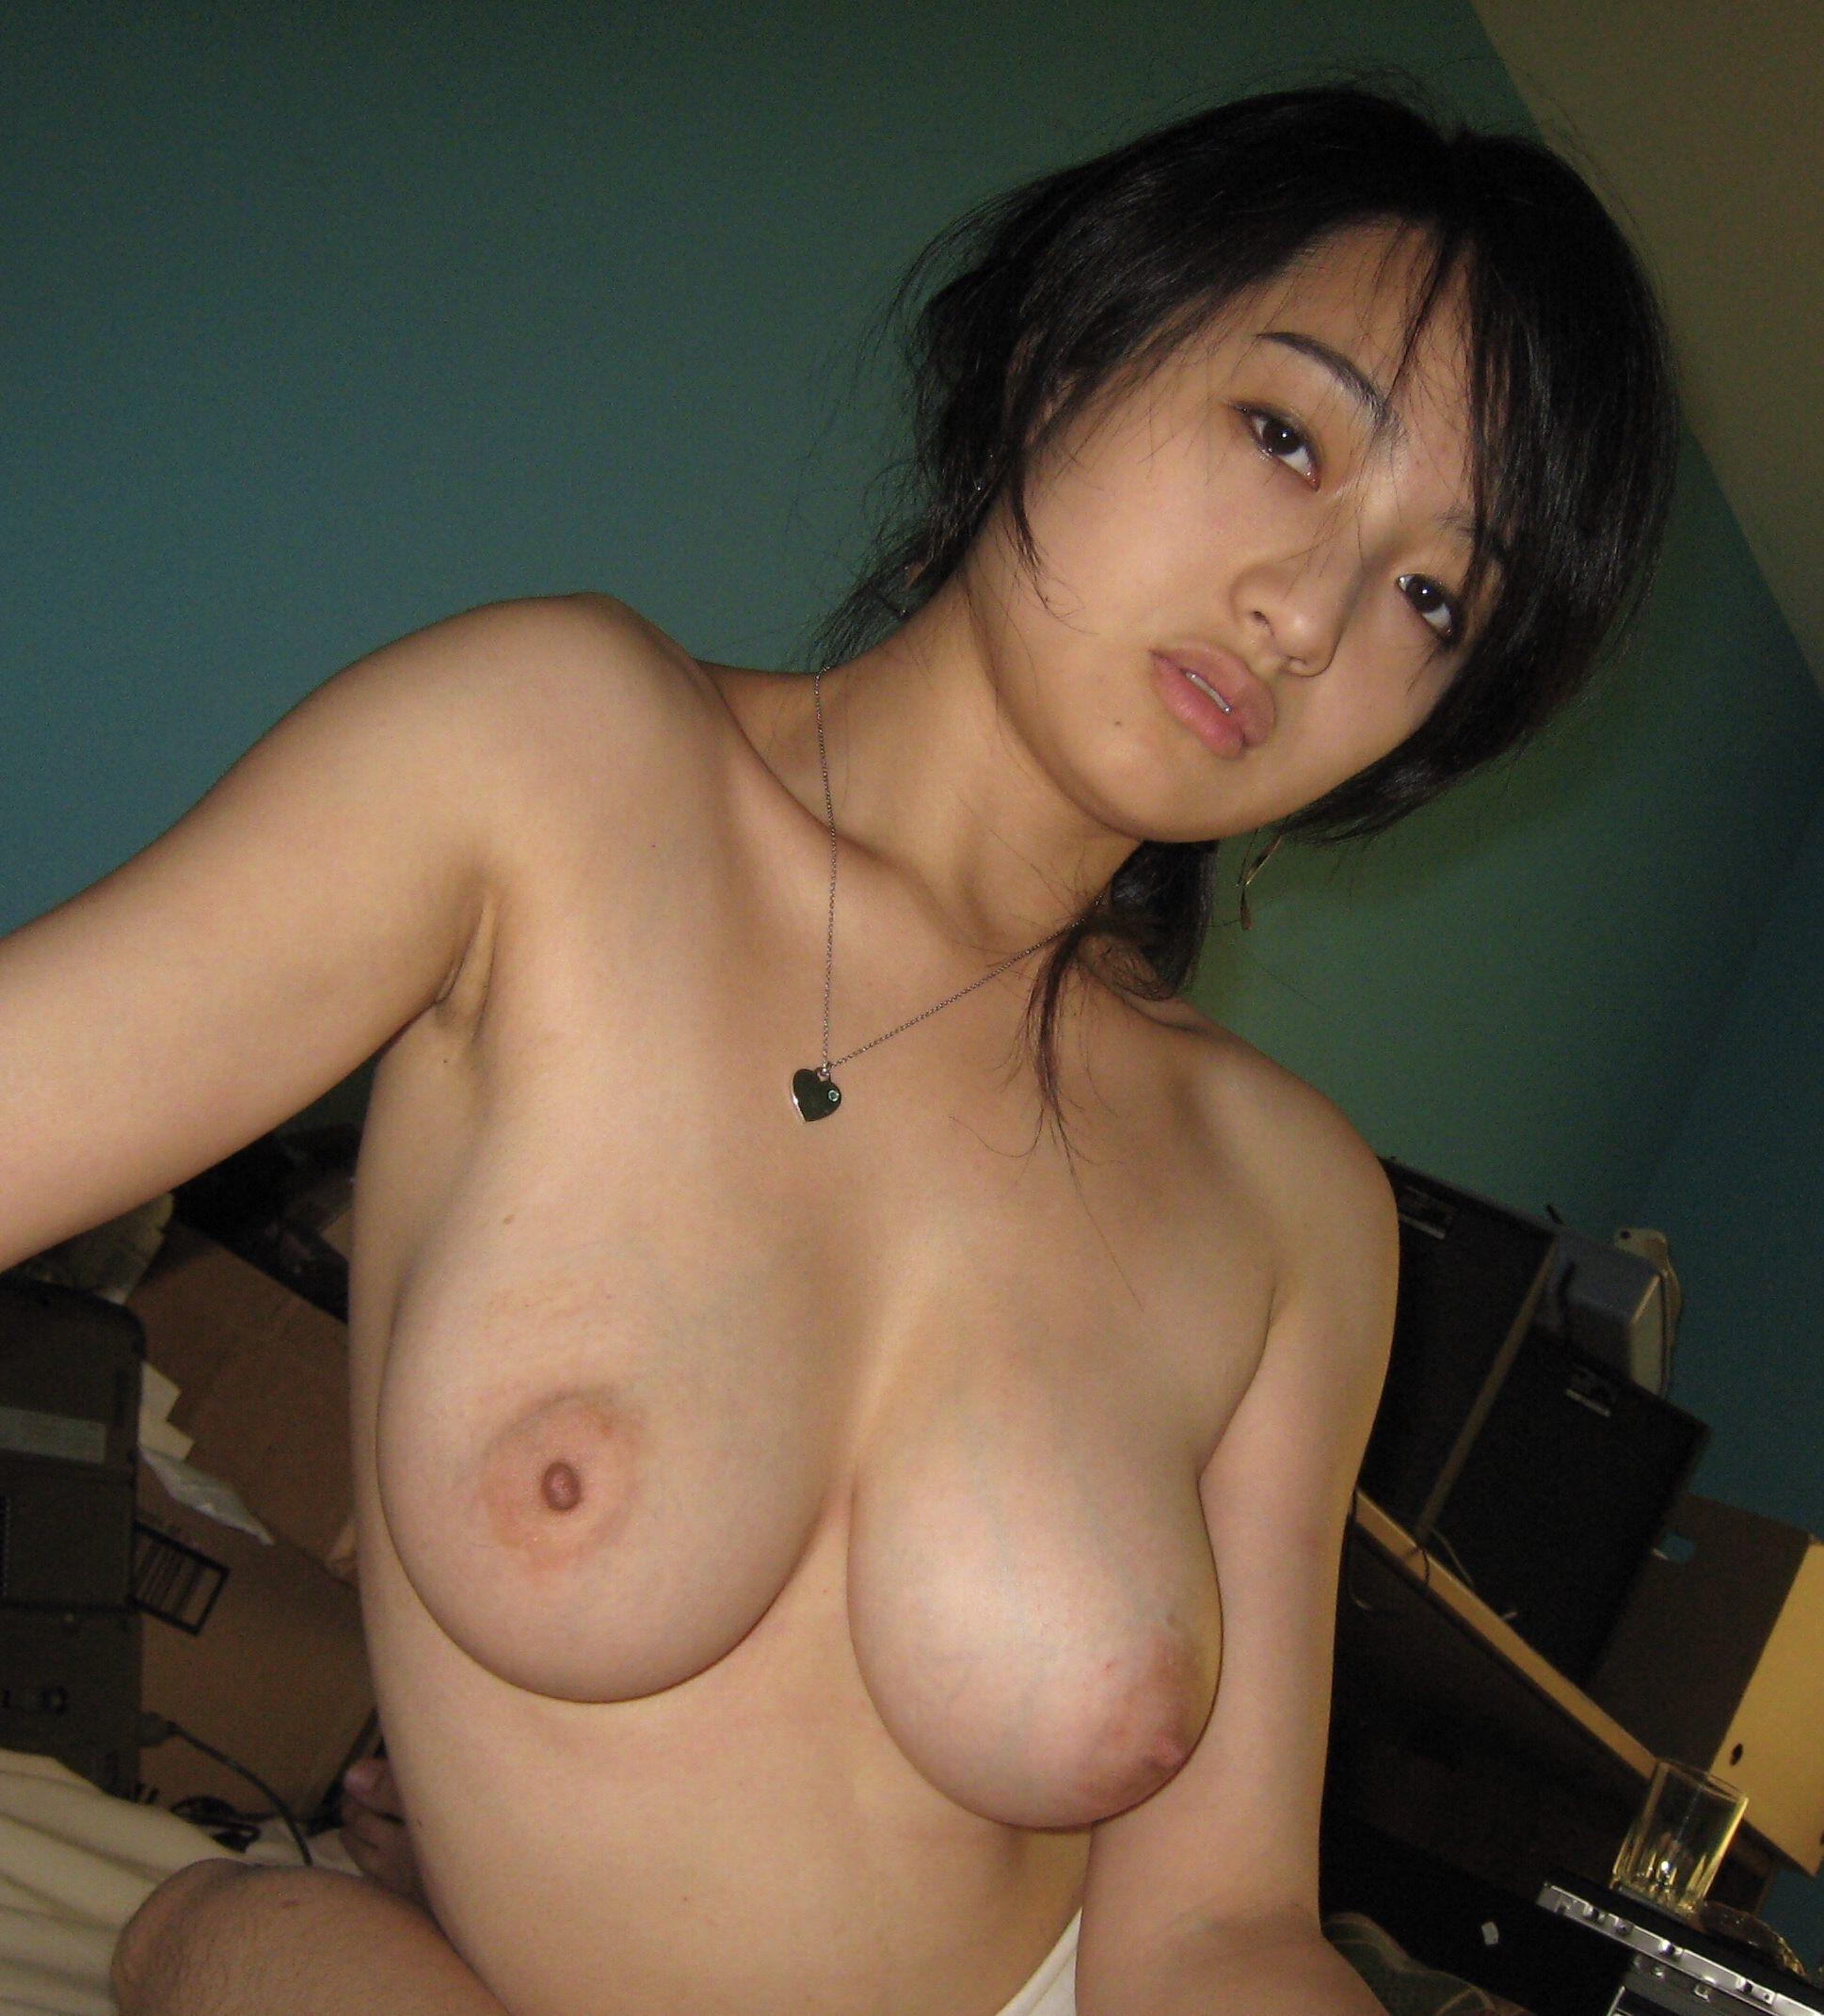 Actriz Porno Katrina Moreno ready and waiting porn pic - eporner